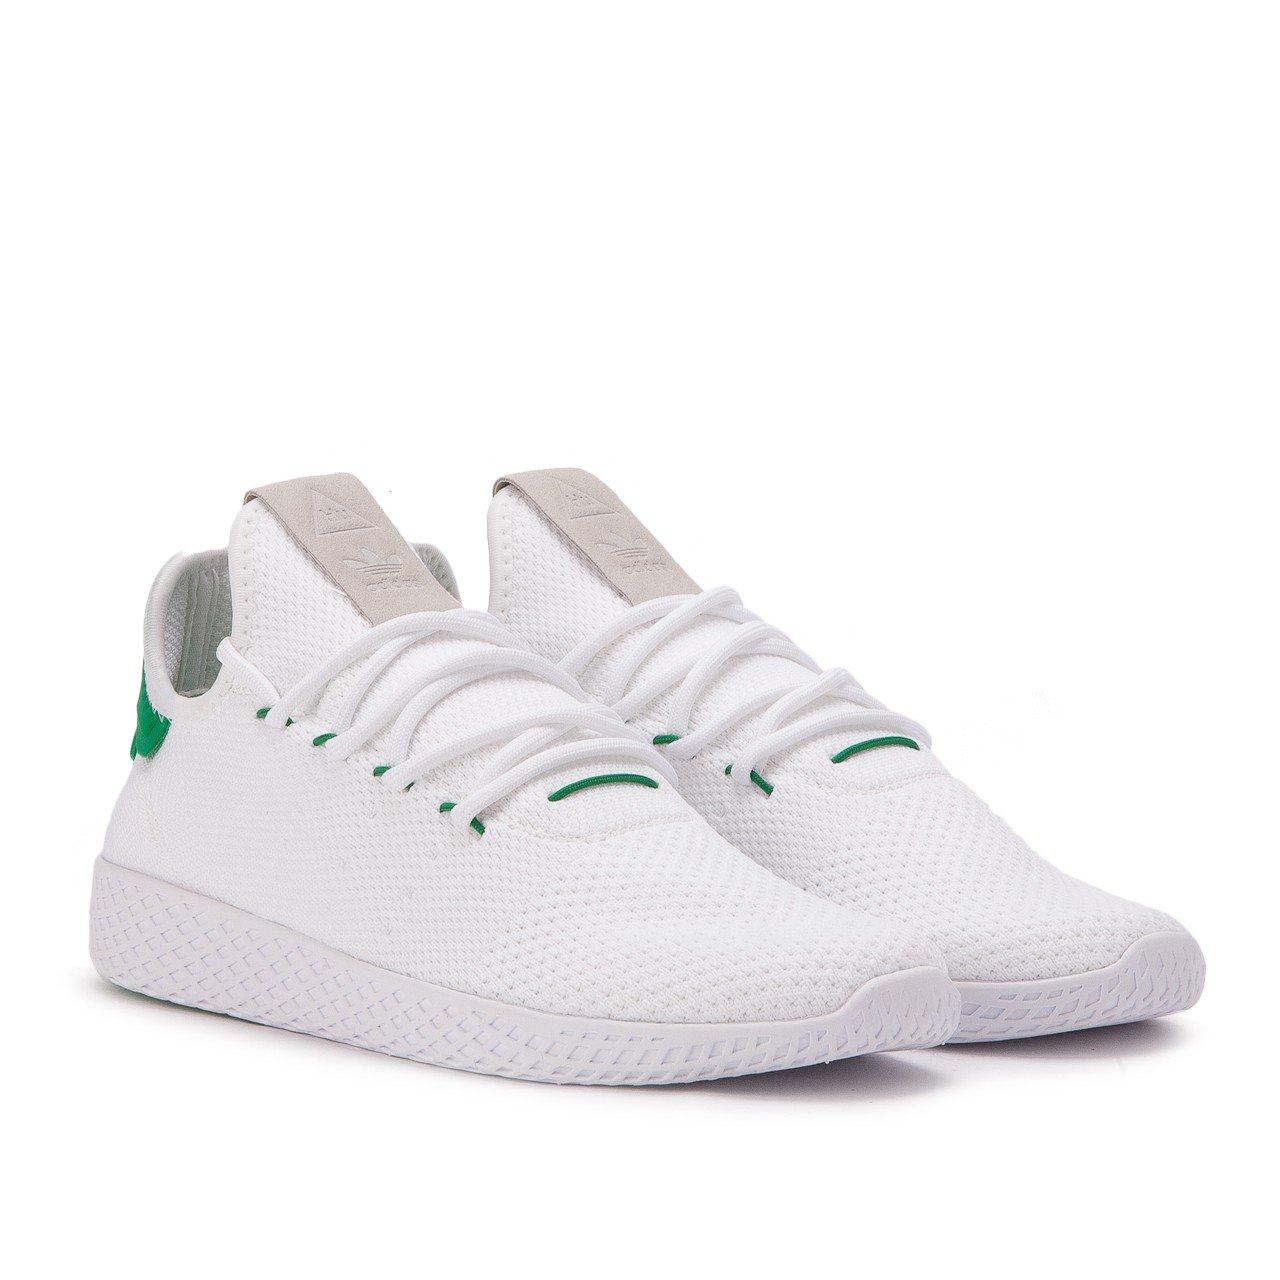 blanc, vert Adidas - Pw Tennis Hu - - Basket - Femme  rentable